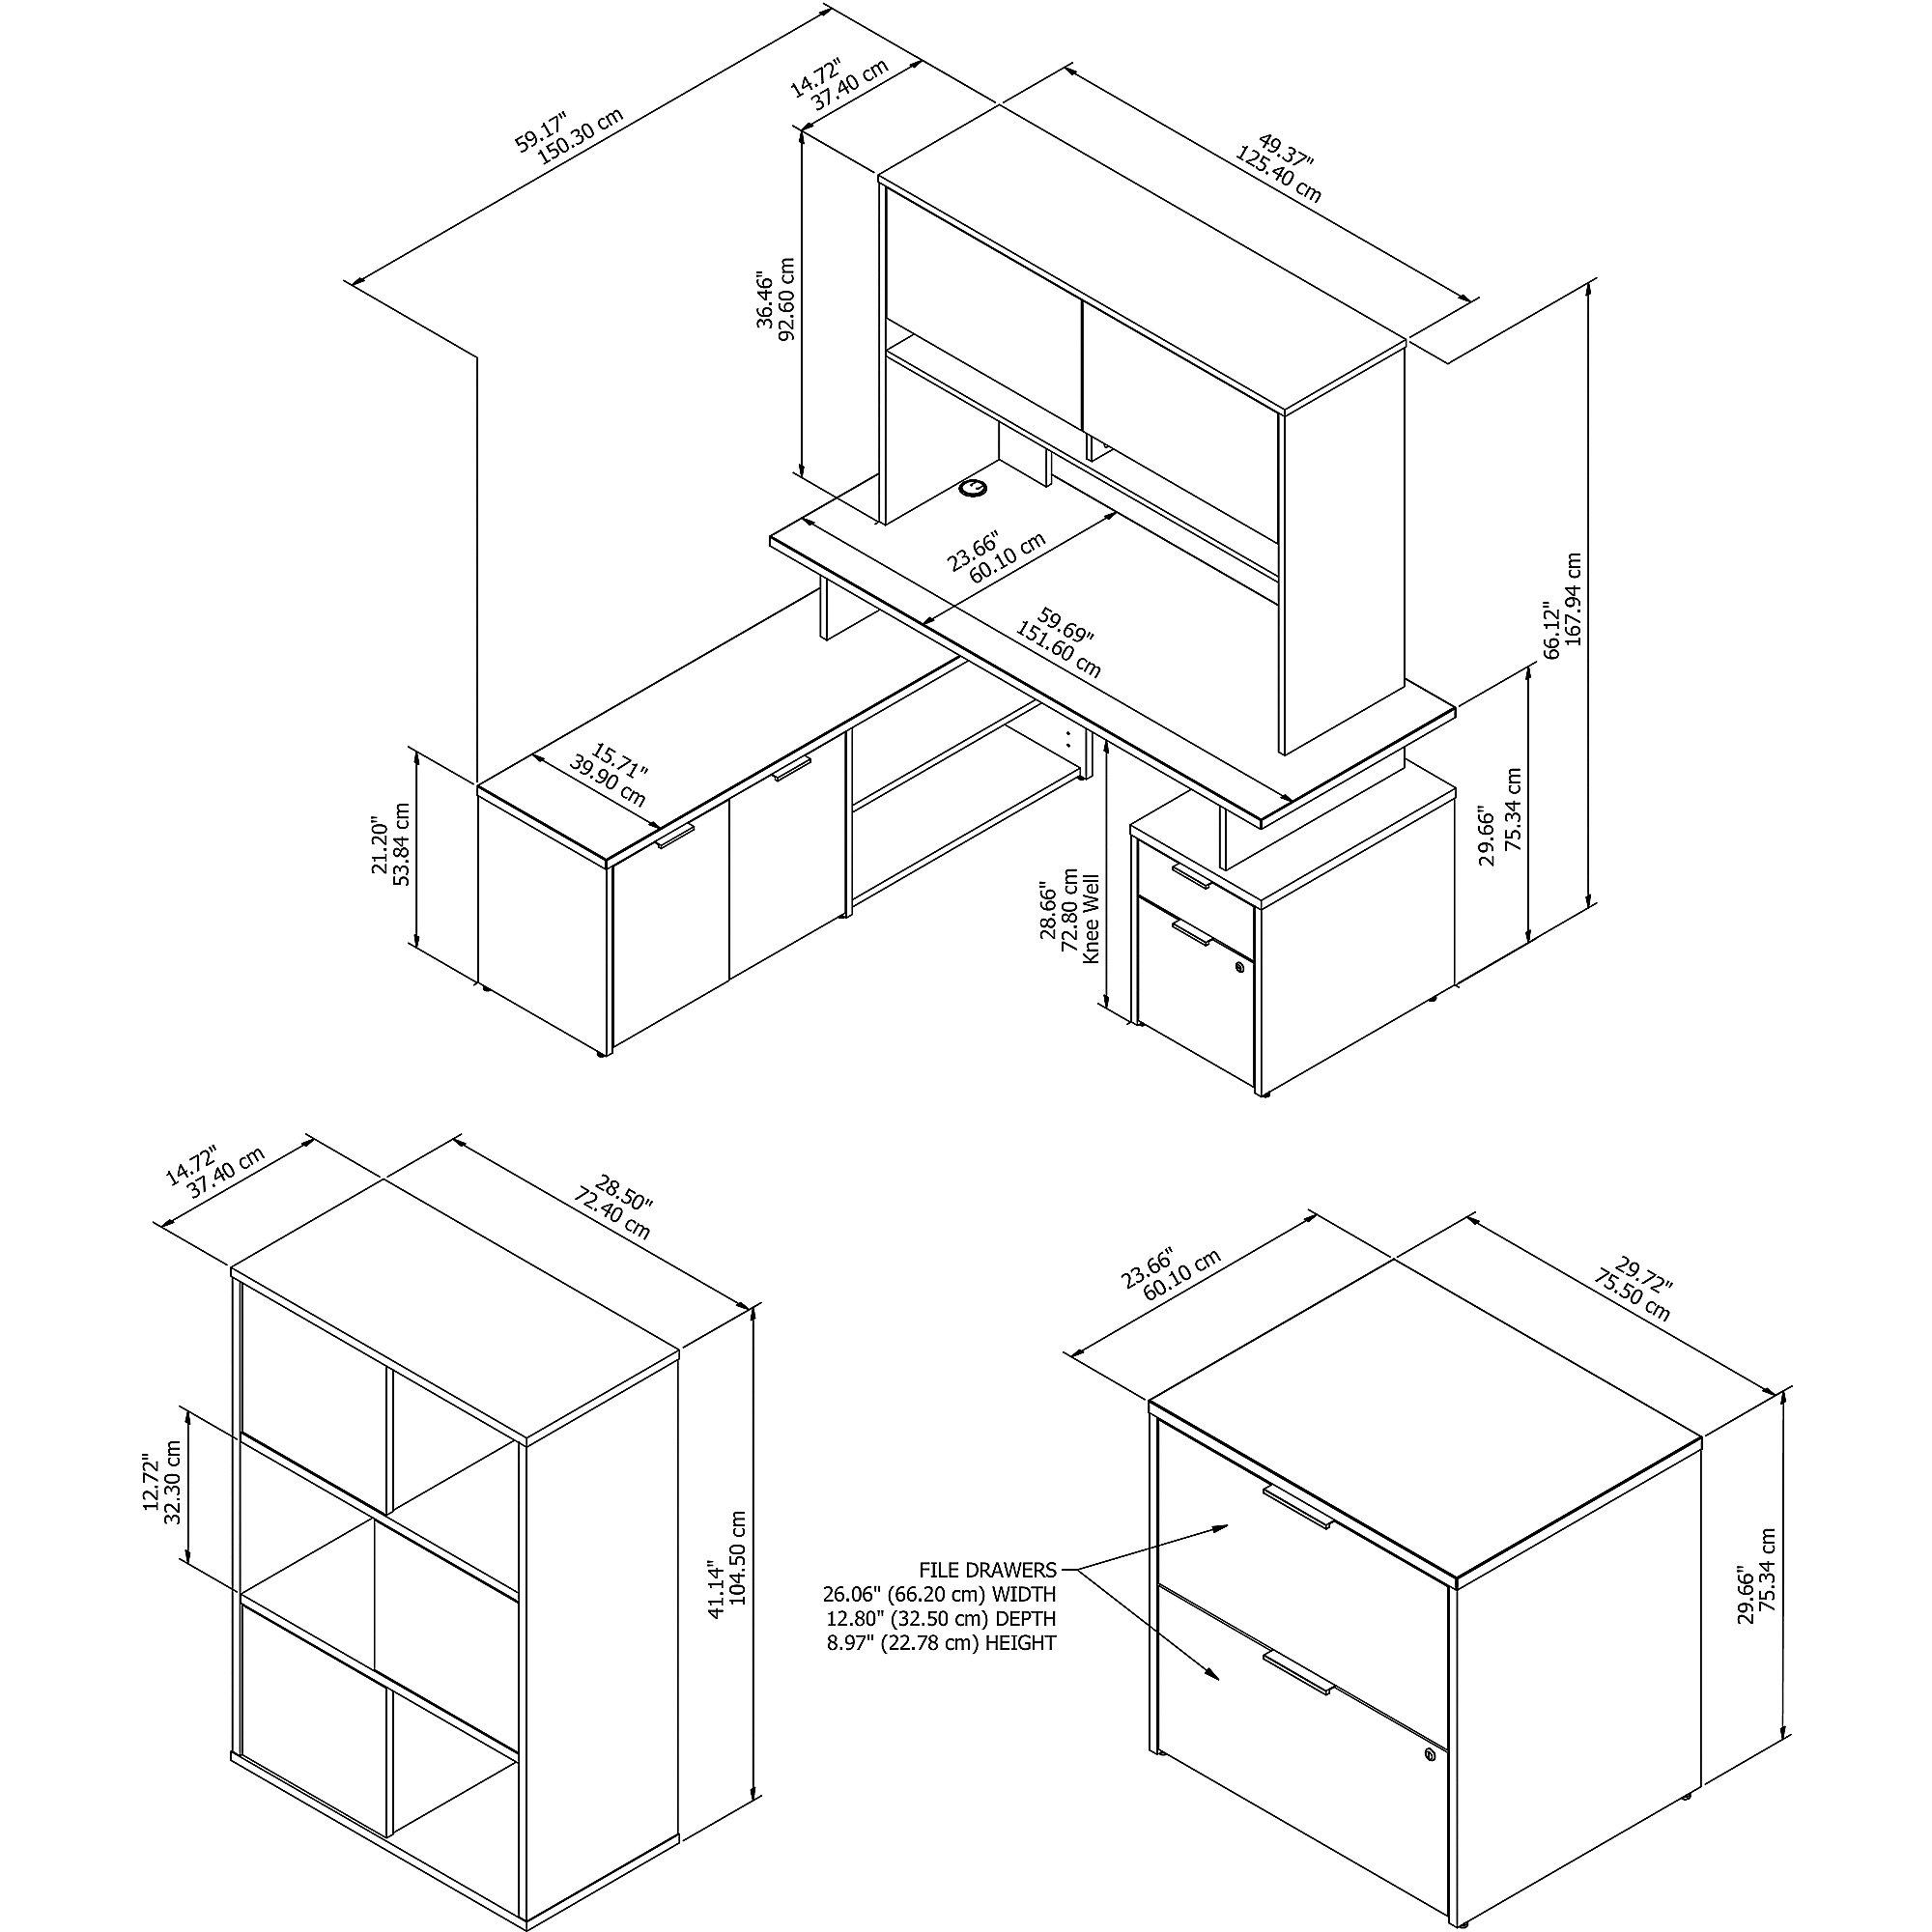 jtn024 desk set dimensions